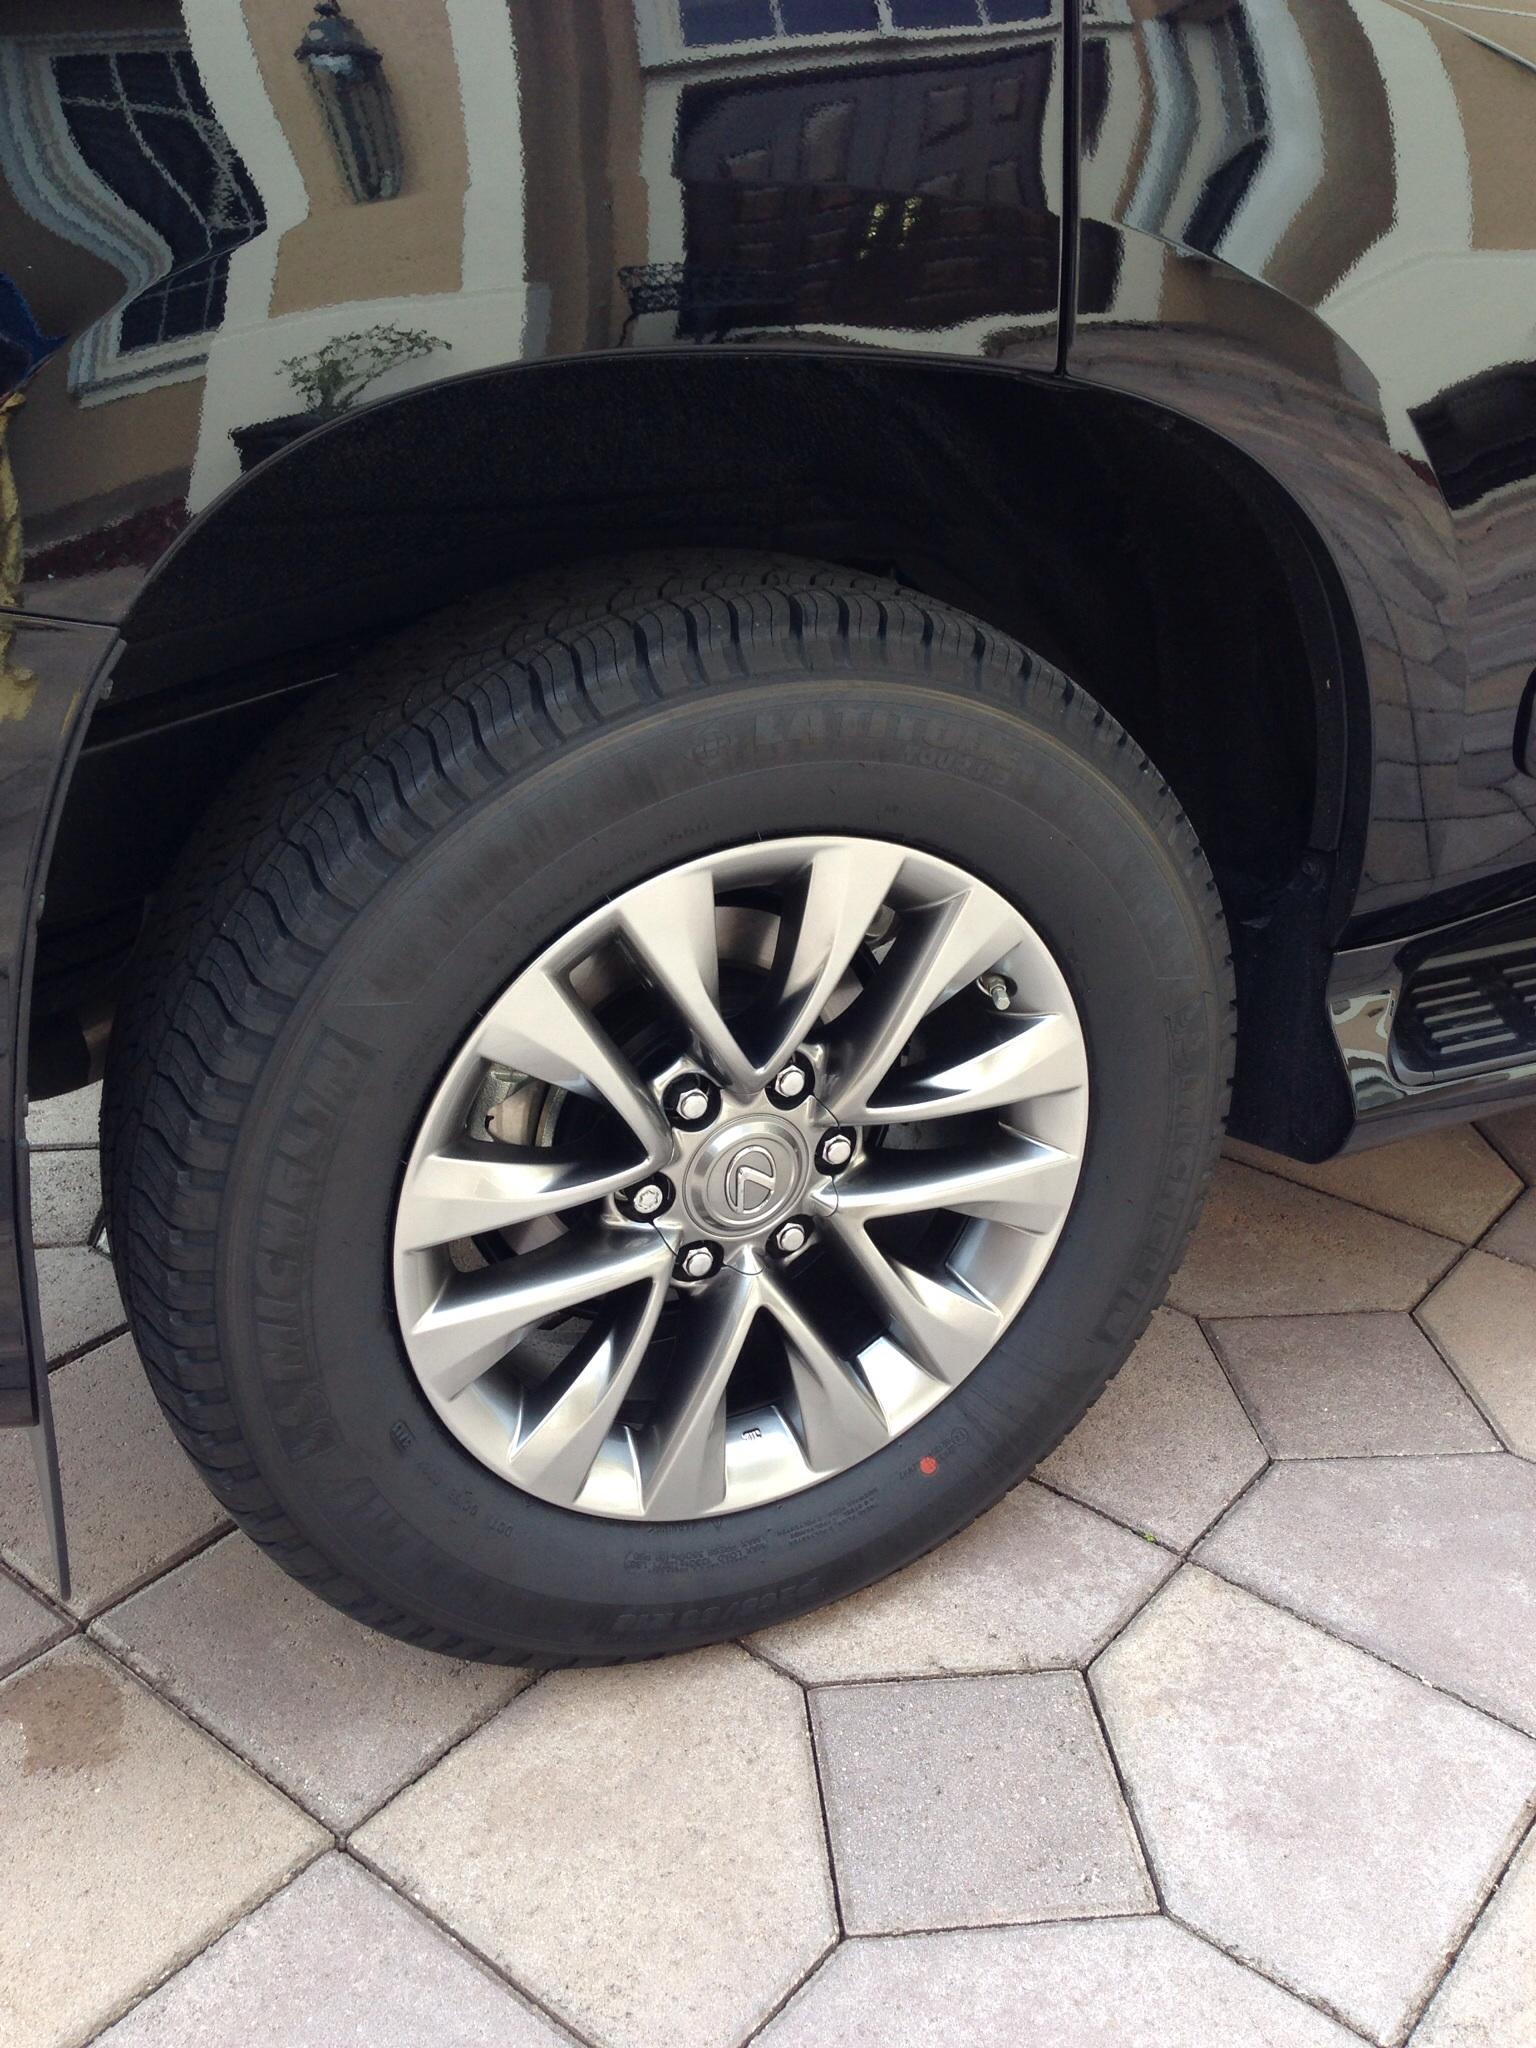 Tires on 2014 GX460 Luxury ClubLexus Lexus Forum Discussion